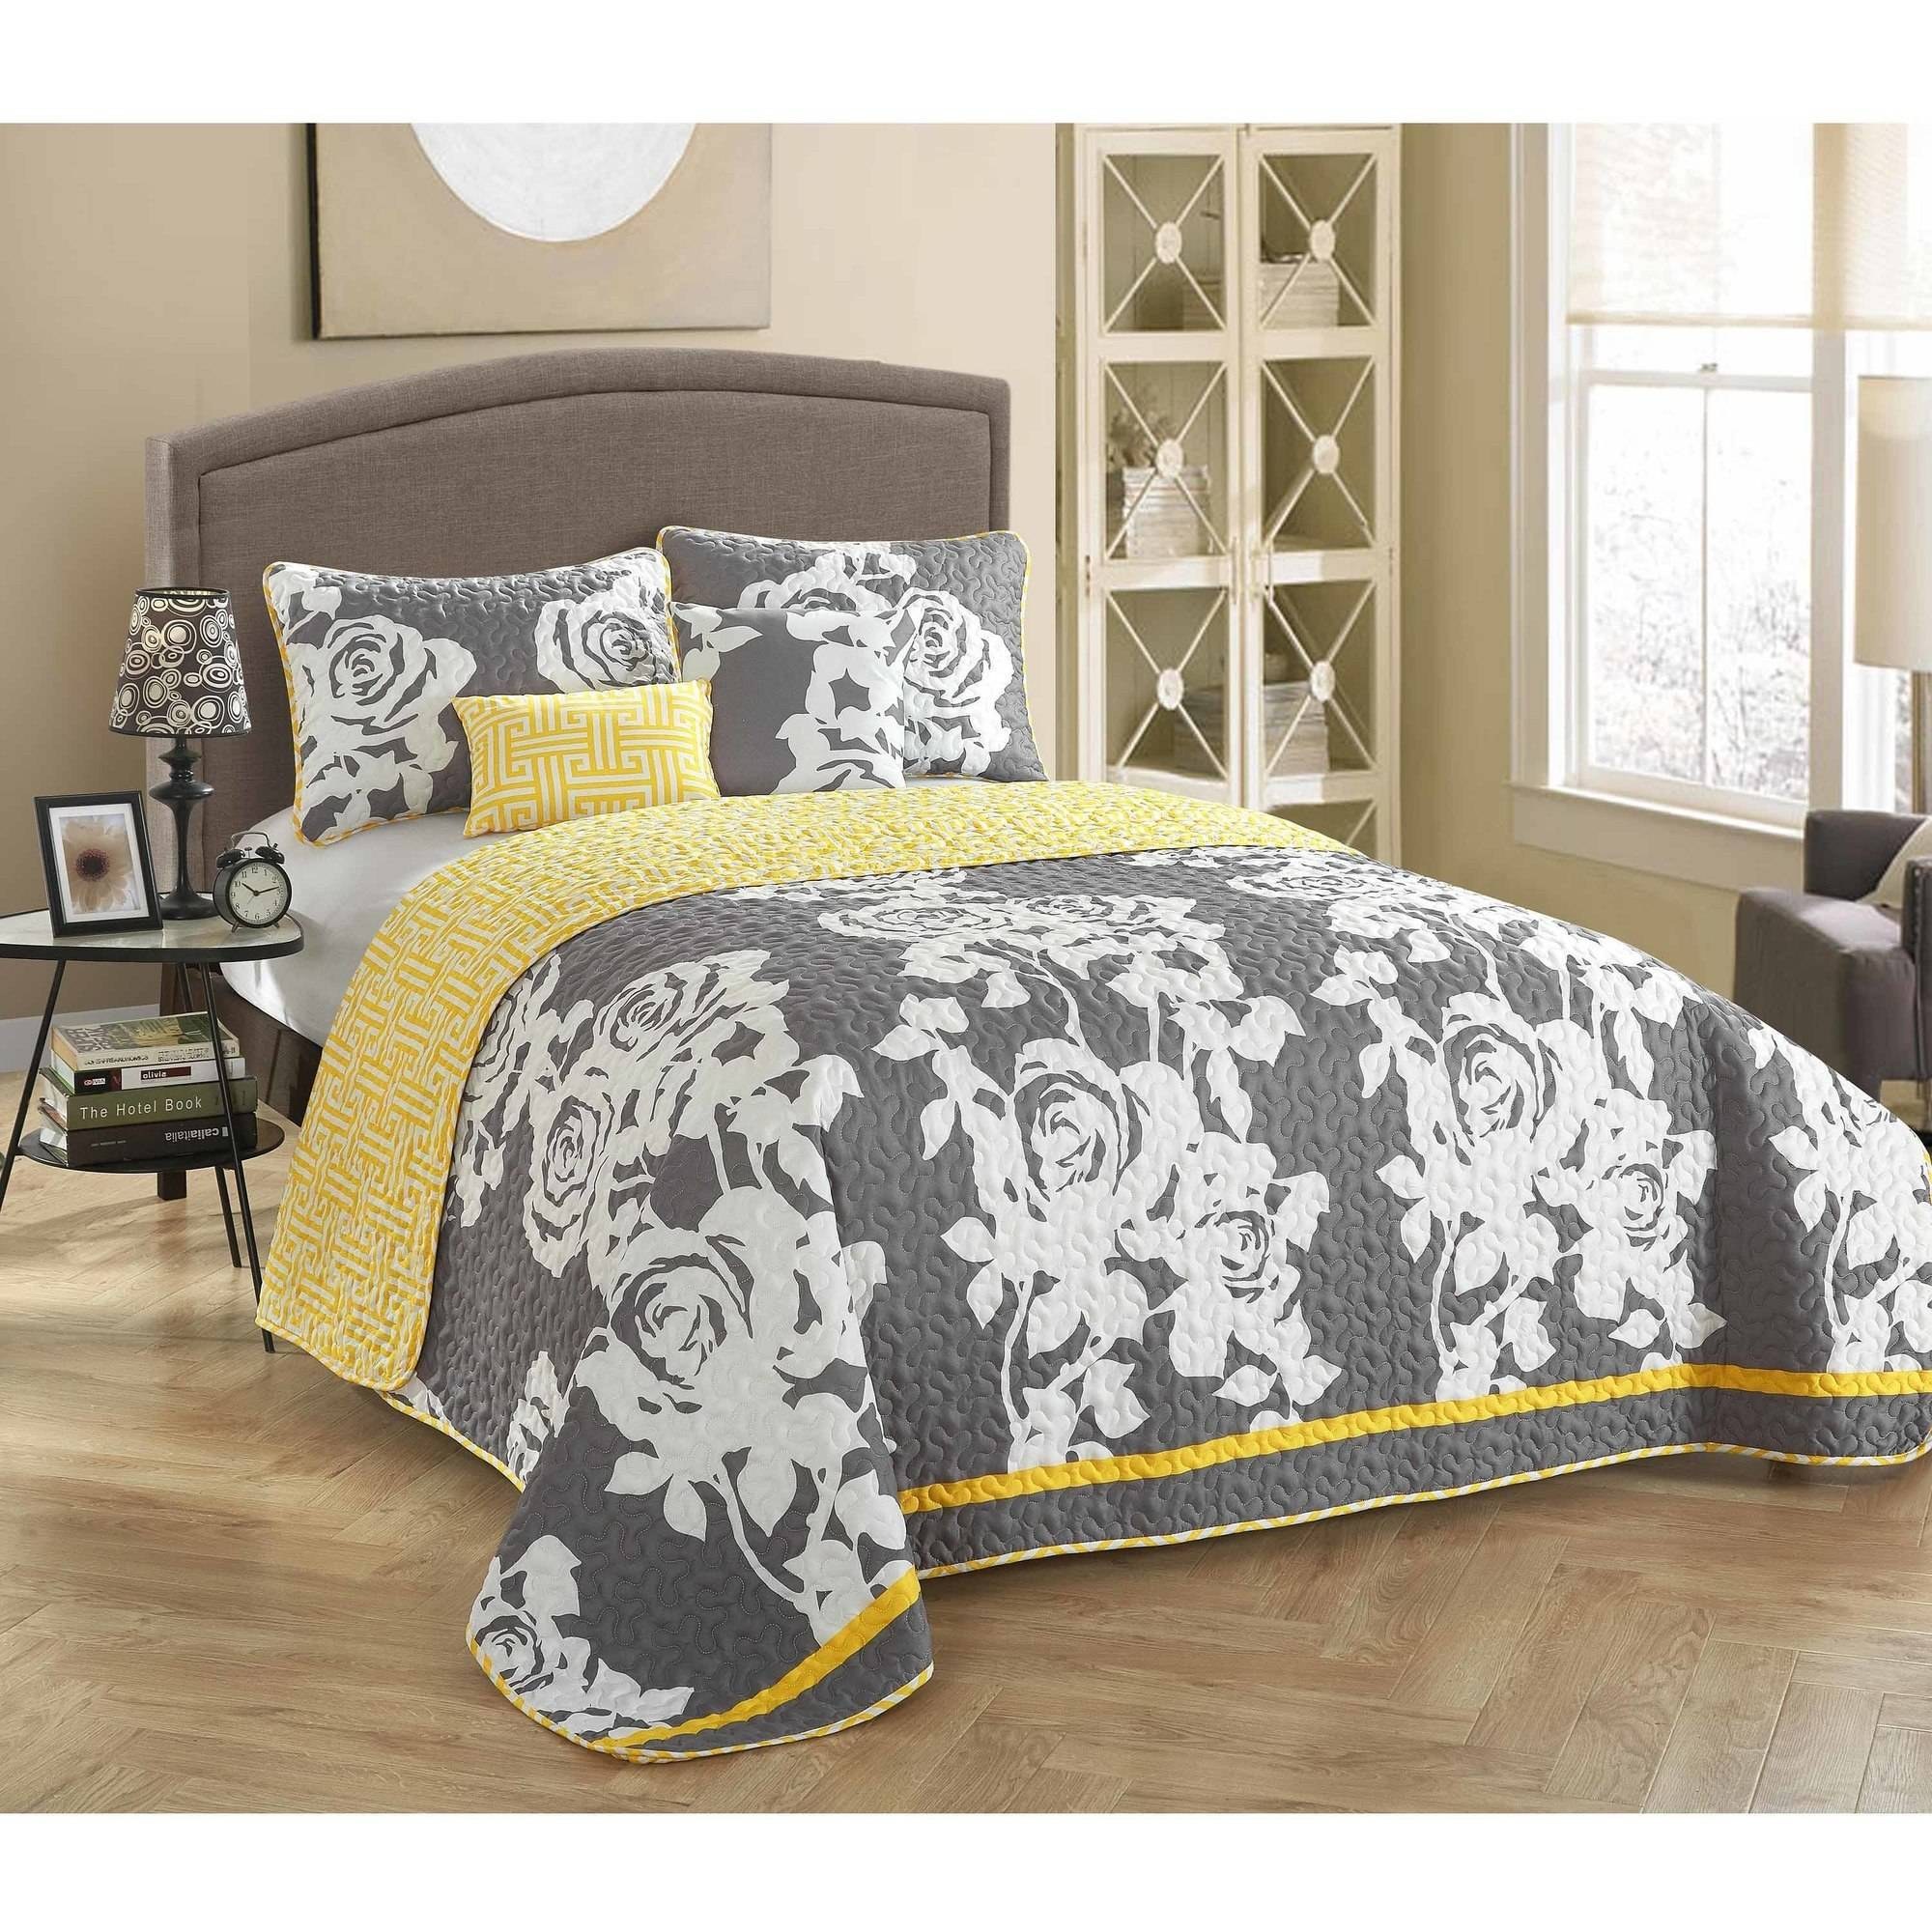 StyleNest SouthBeach Rose 5-Piece Bedding Quilt Set by Idea Nuova